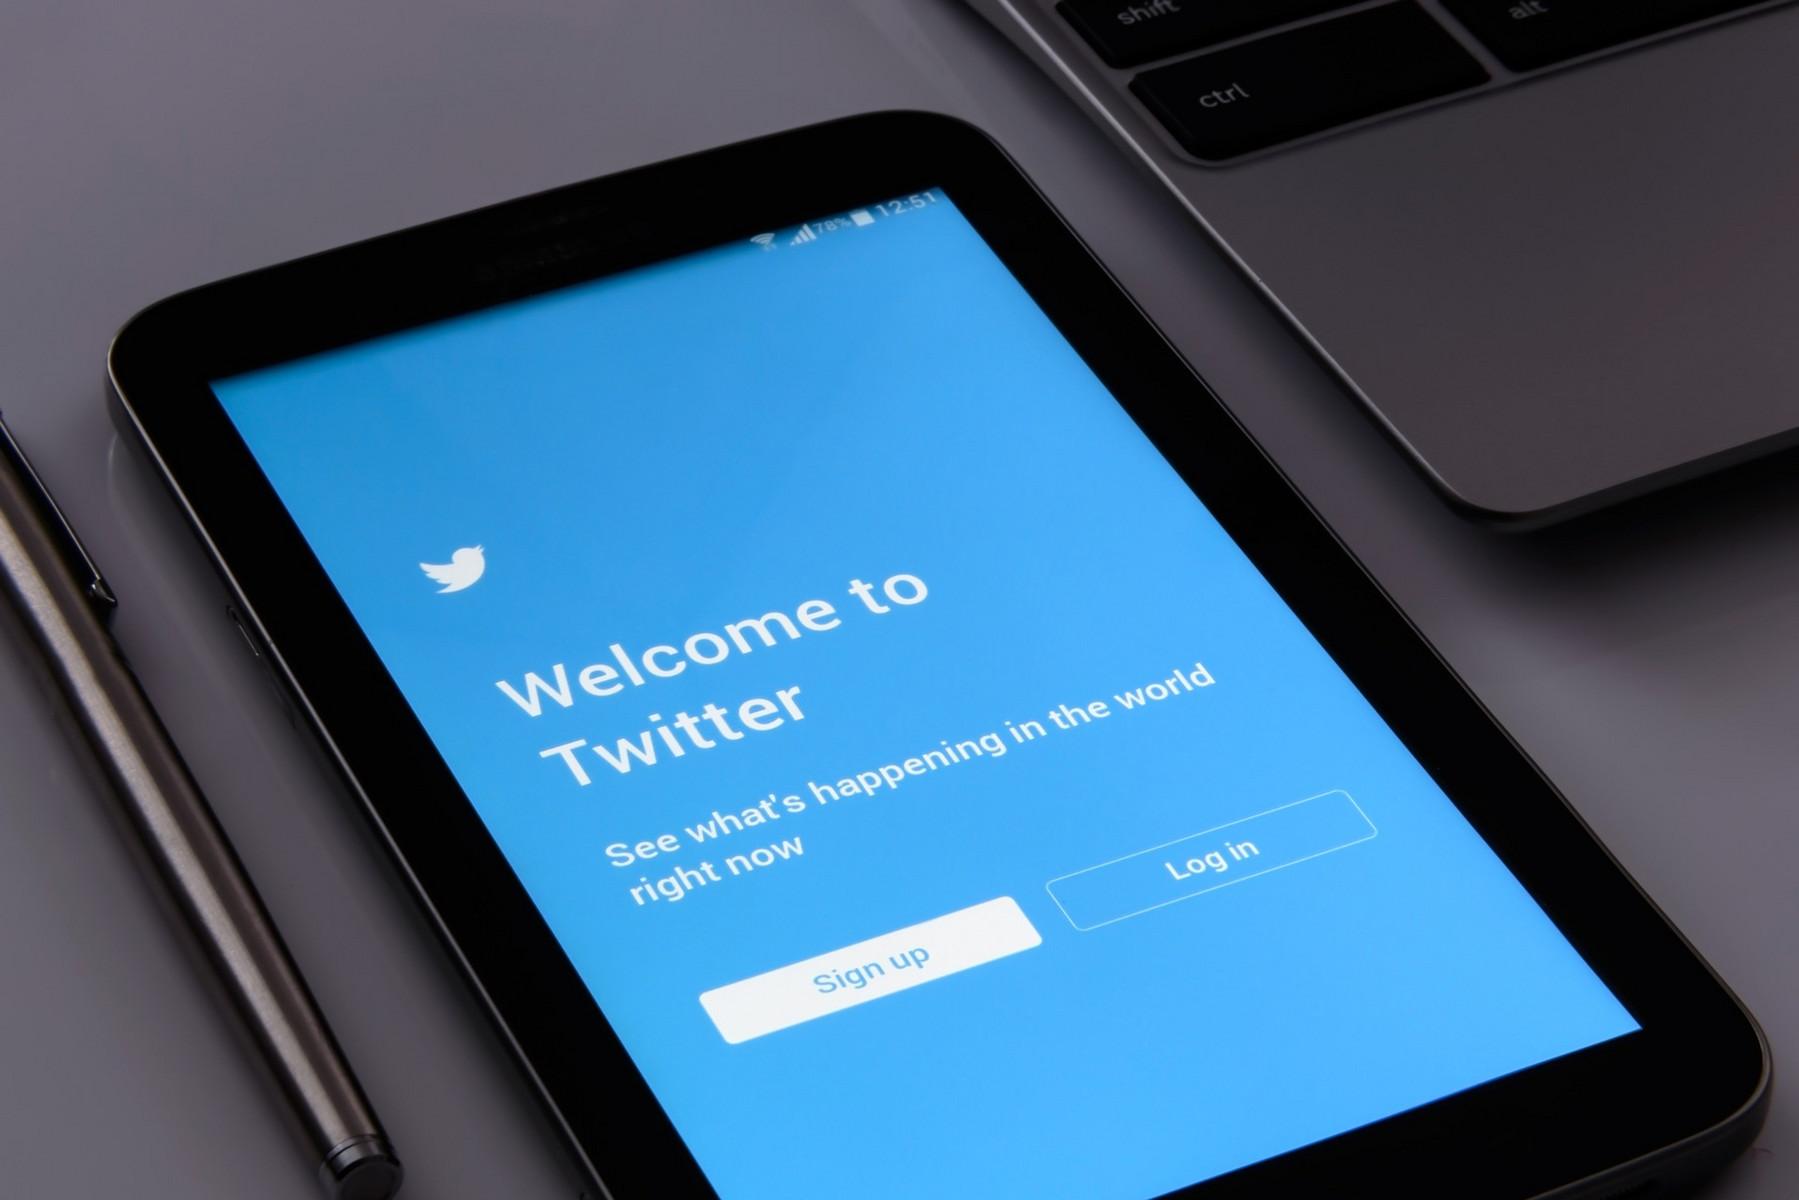 Cambridge Analytica: Twitter gab Datensätze an beteiligten Wissenschaftler